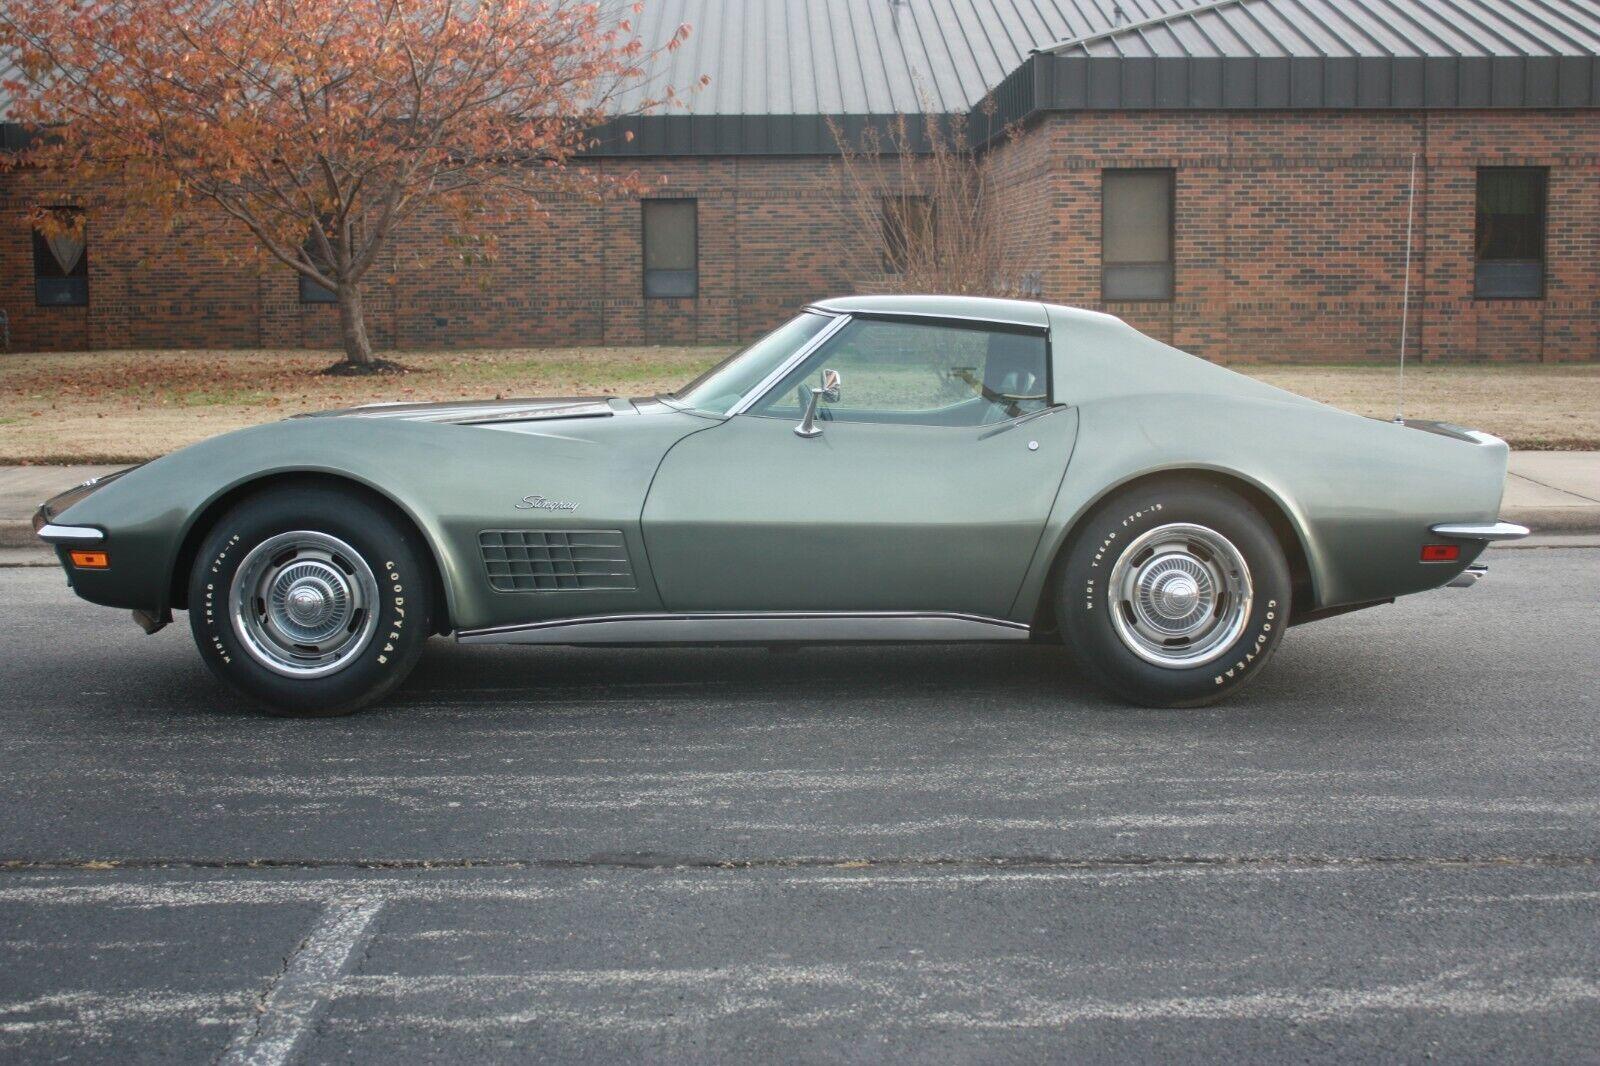 1971 Steel Cities Gray Chevrolet Corvette     C3 Corvette Photo 1